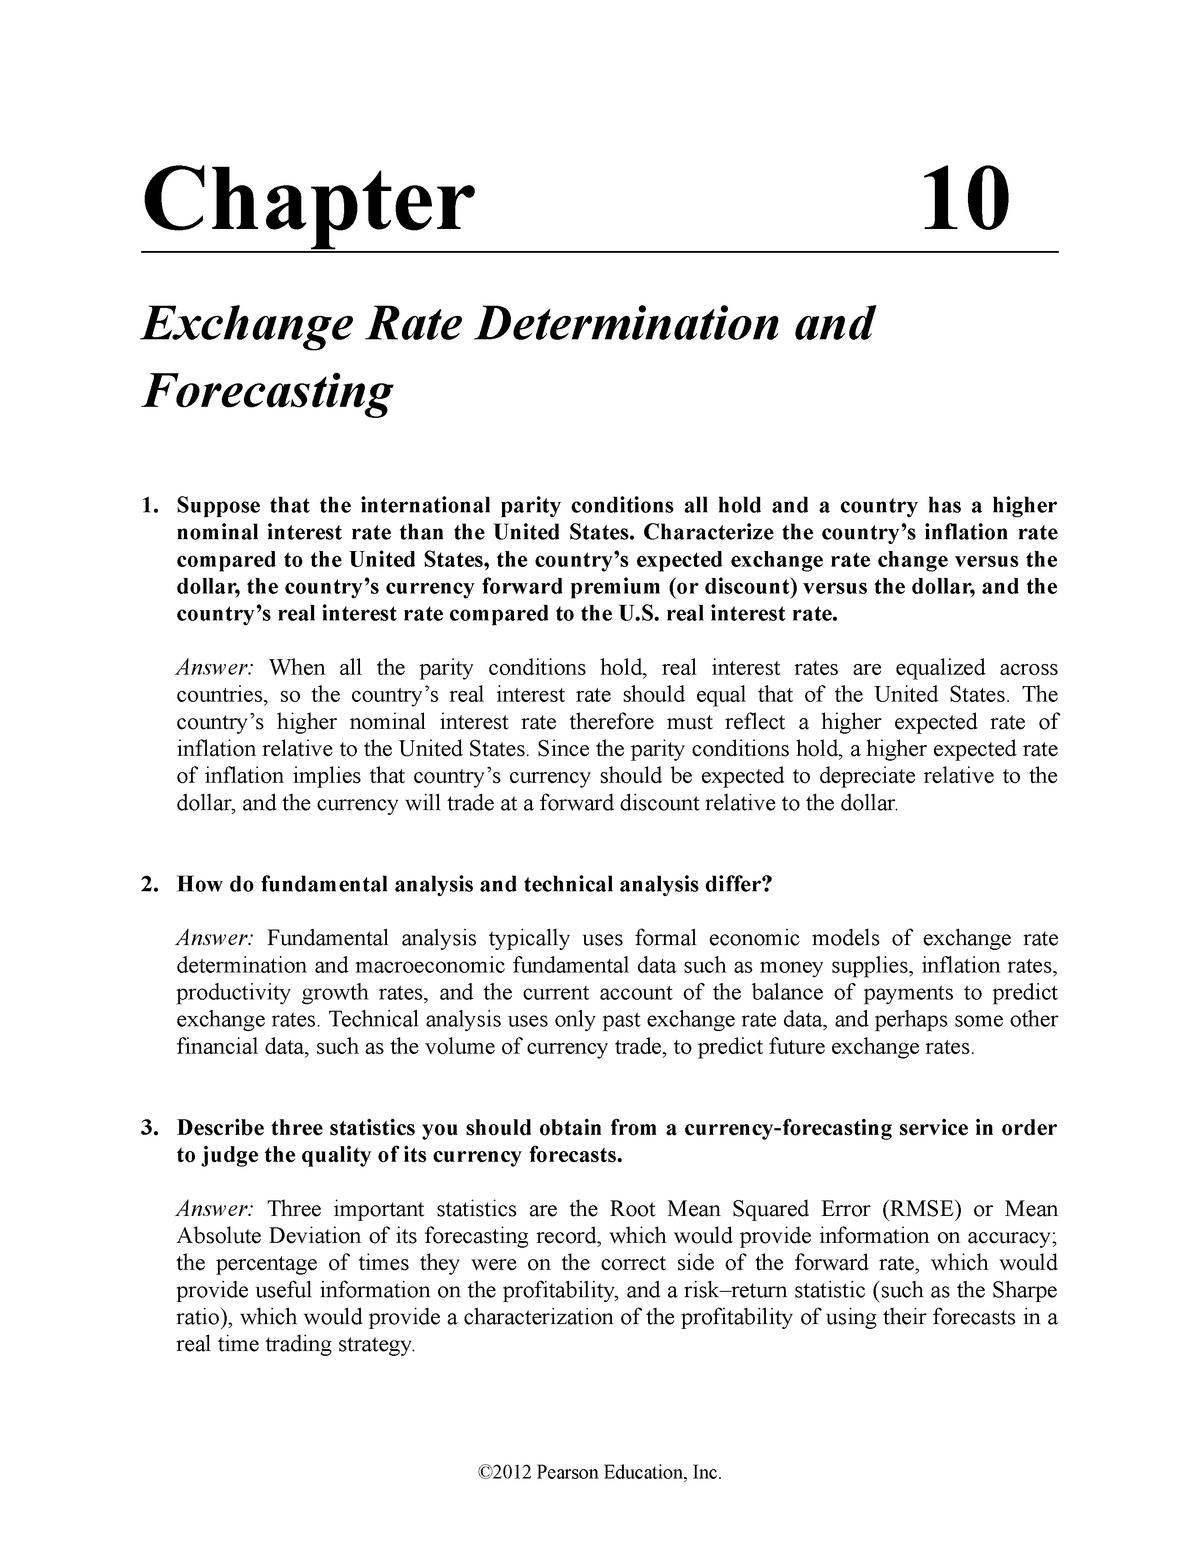 Tutorial Ch10 - Answers - FINS3616: International Business